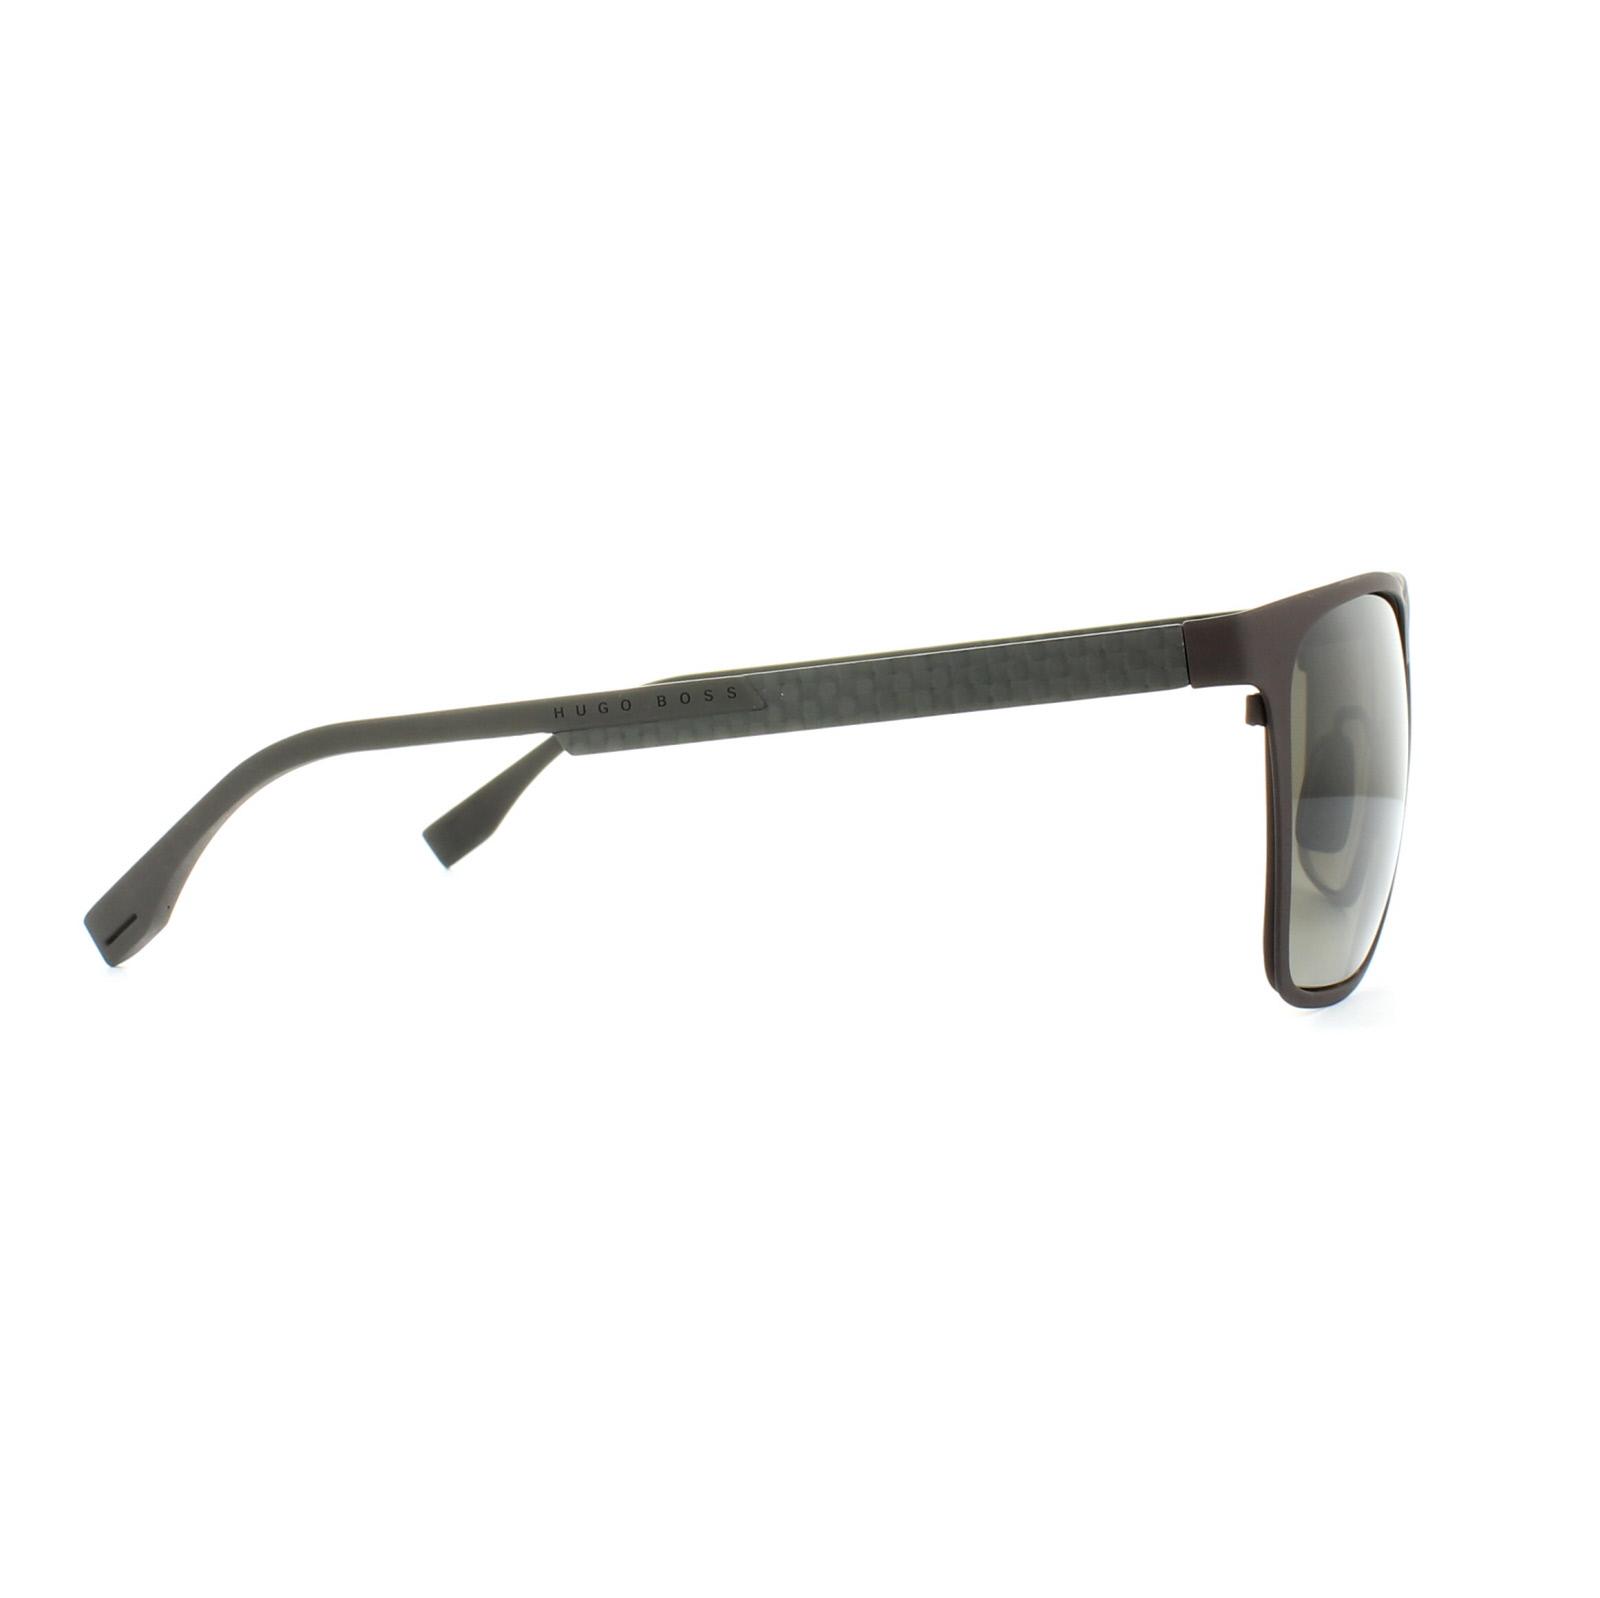 Sentinel Hugo Boss Sunglasses 0732 KCR HA Matt Brown Carbon Brown Gradient f914245cfe72